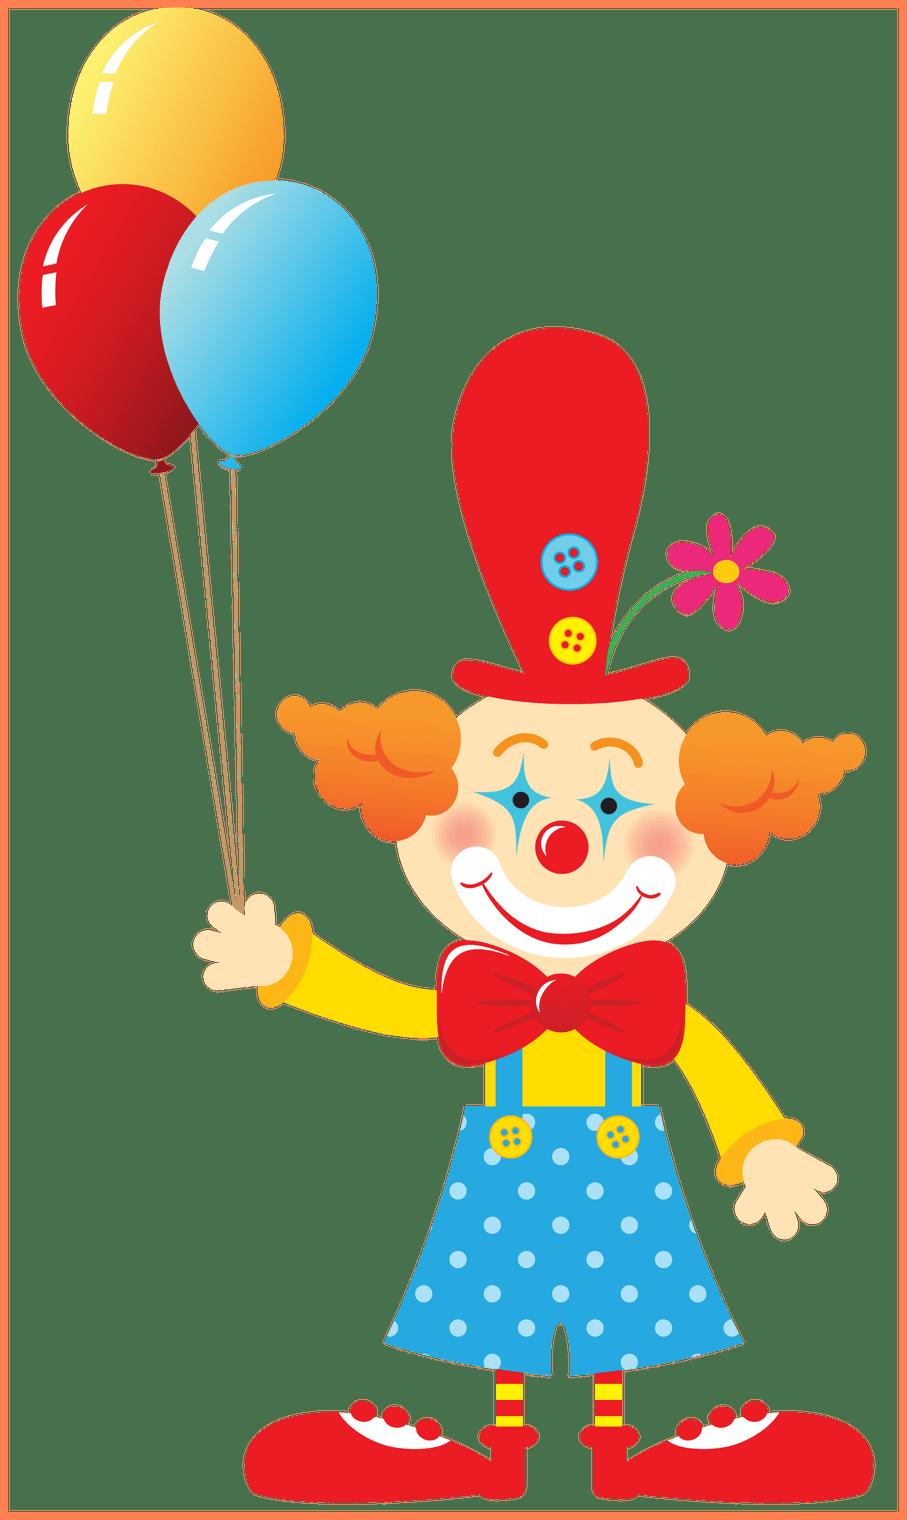 Appealing photo by danimfalcao. Lady clipart clown